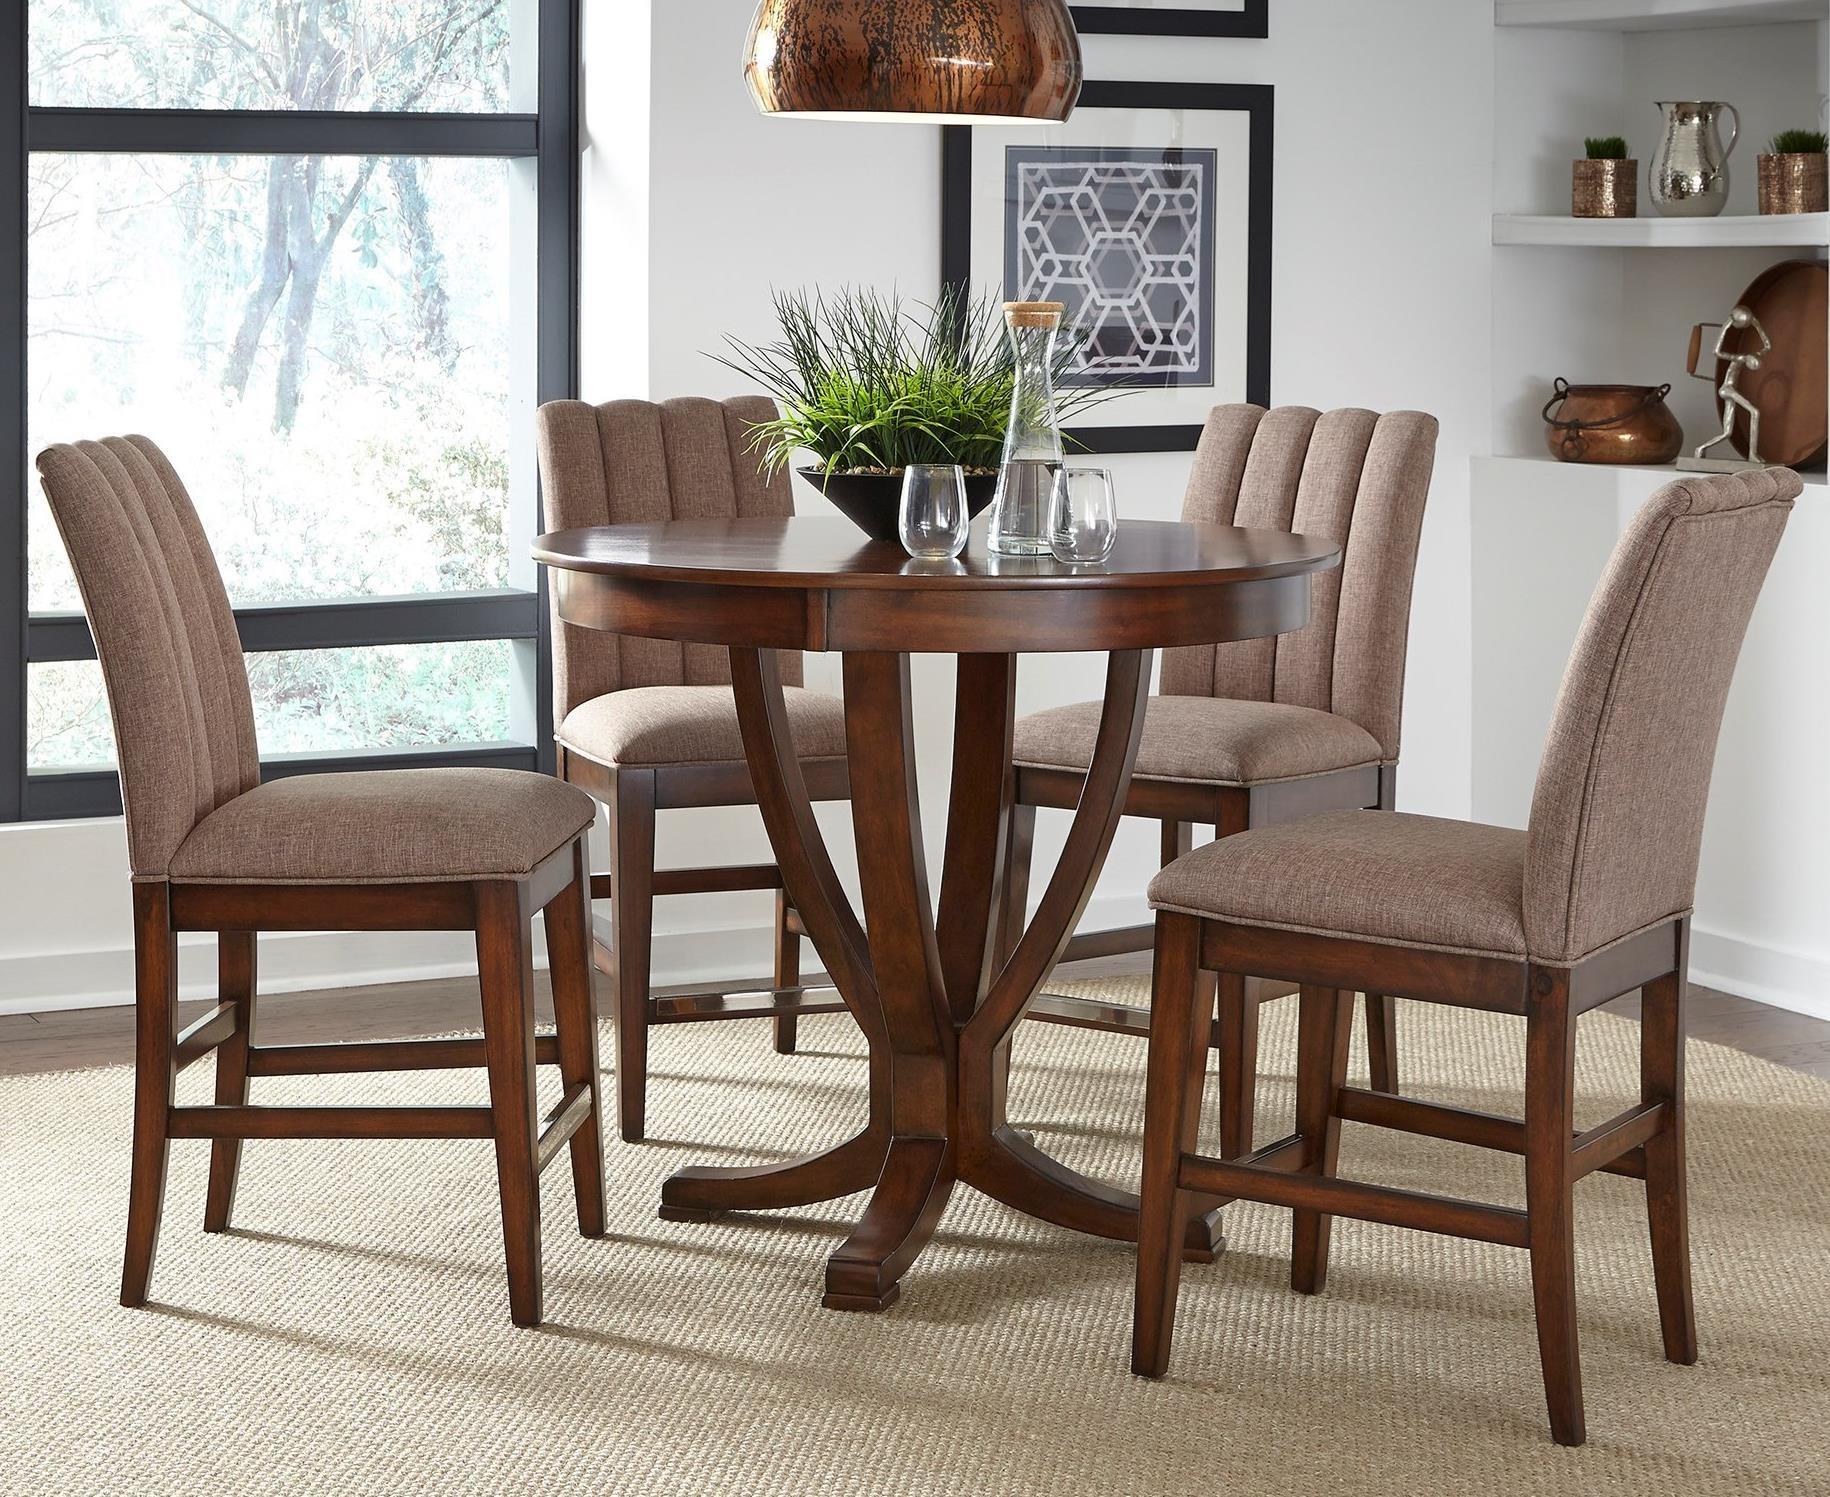 Liberty Furniture Mirage Dining 5 Piece Gathering Table Set  - Item Number: 234-CD-5GTS